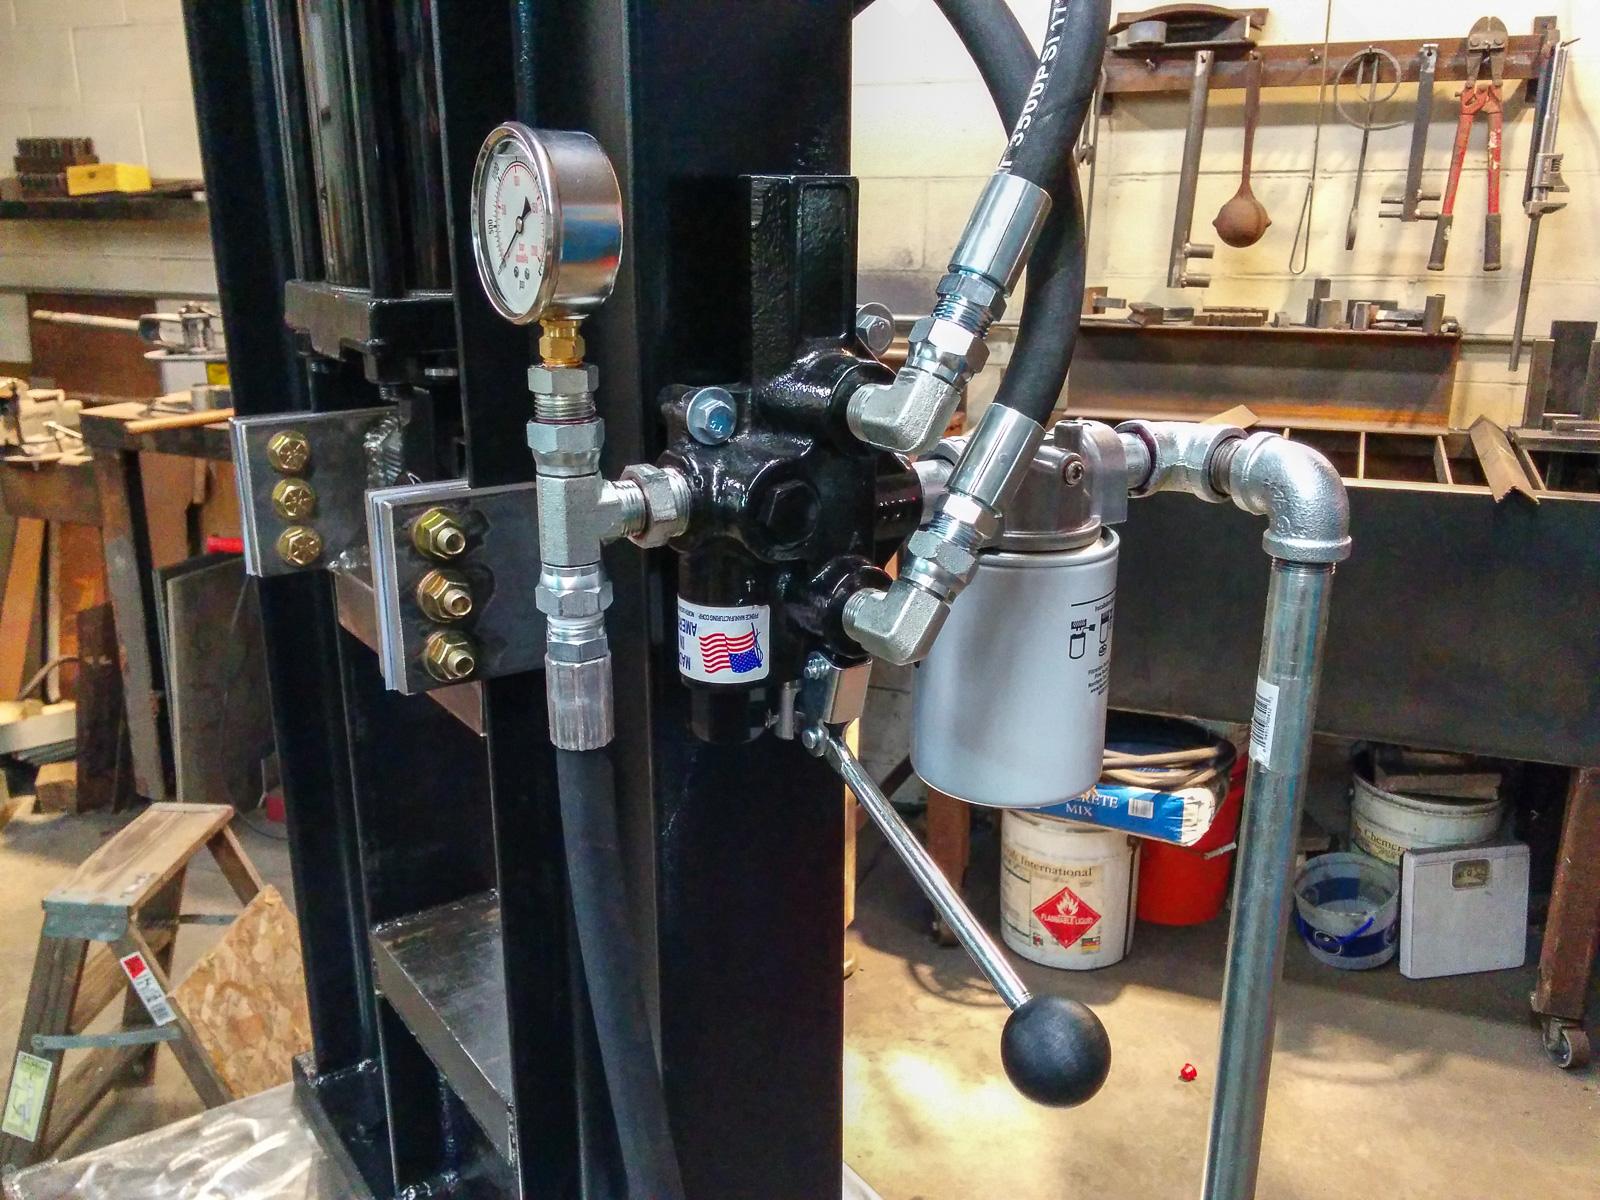 Hydraulic Press Build - Presses